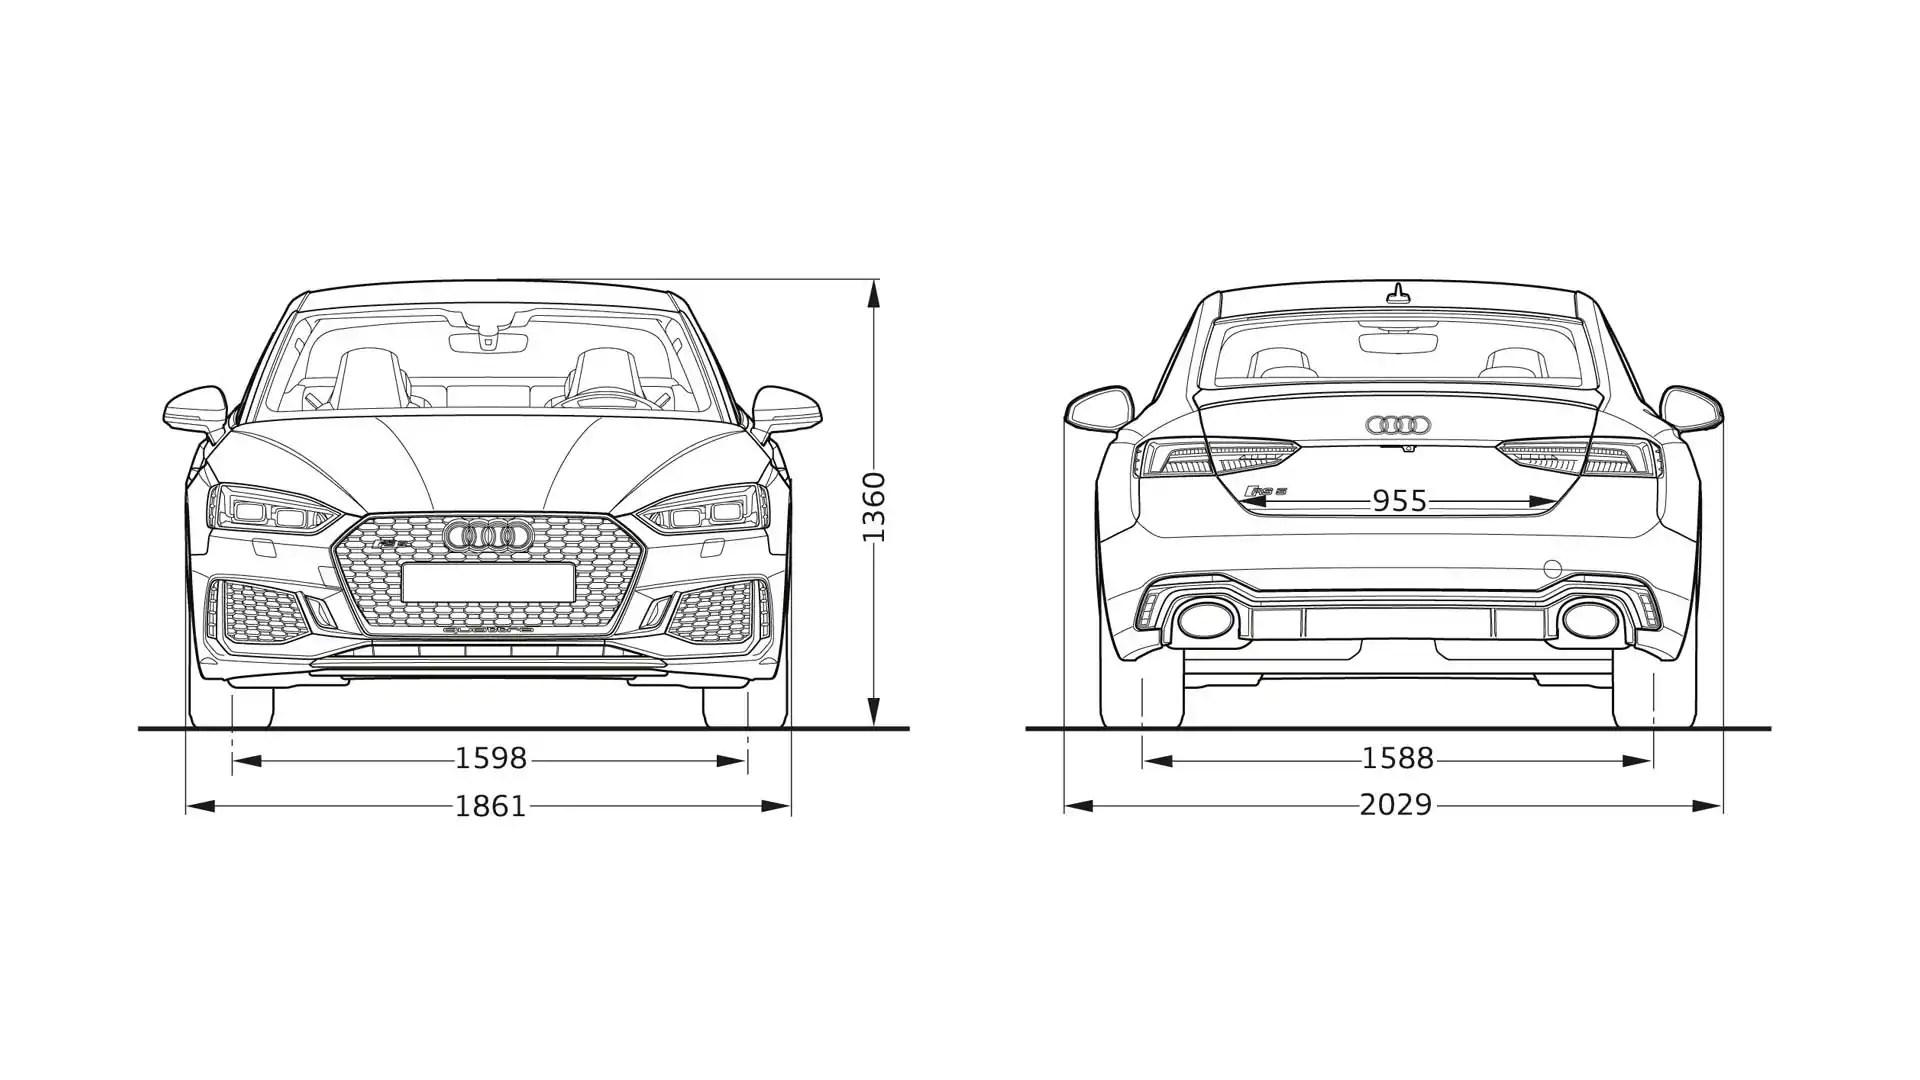 Audi RS5 dimensions > Audi RS5 2019 > Audi A5 2019 > Audi